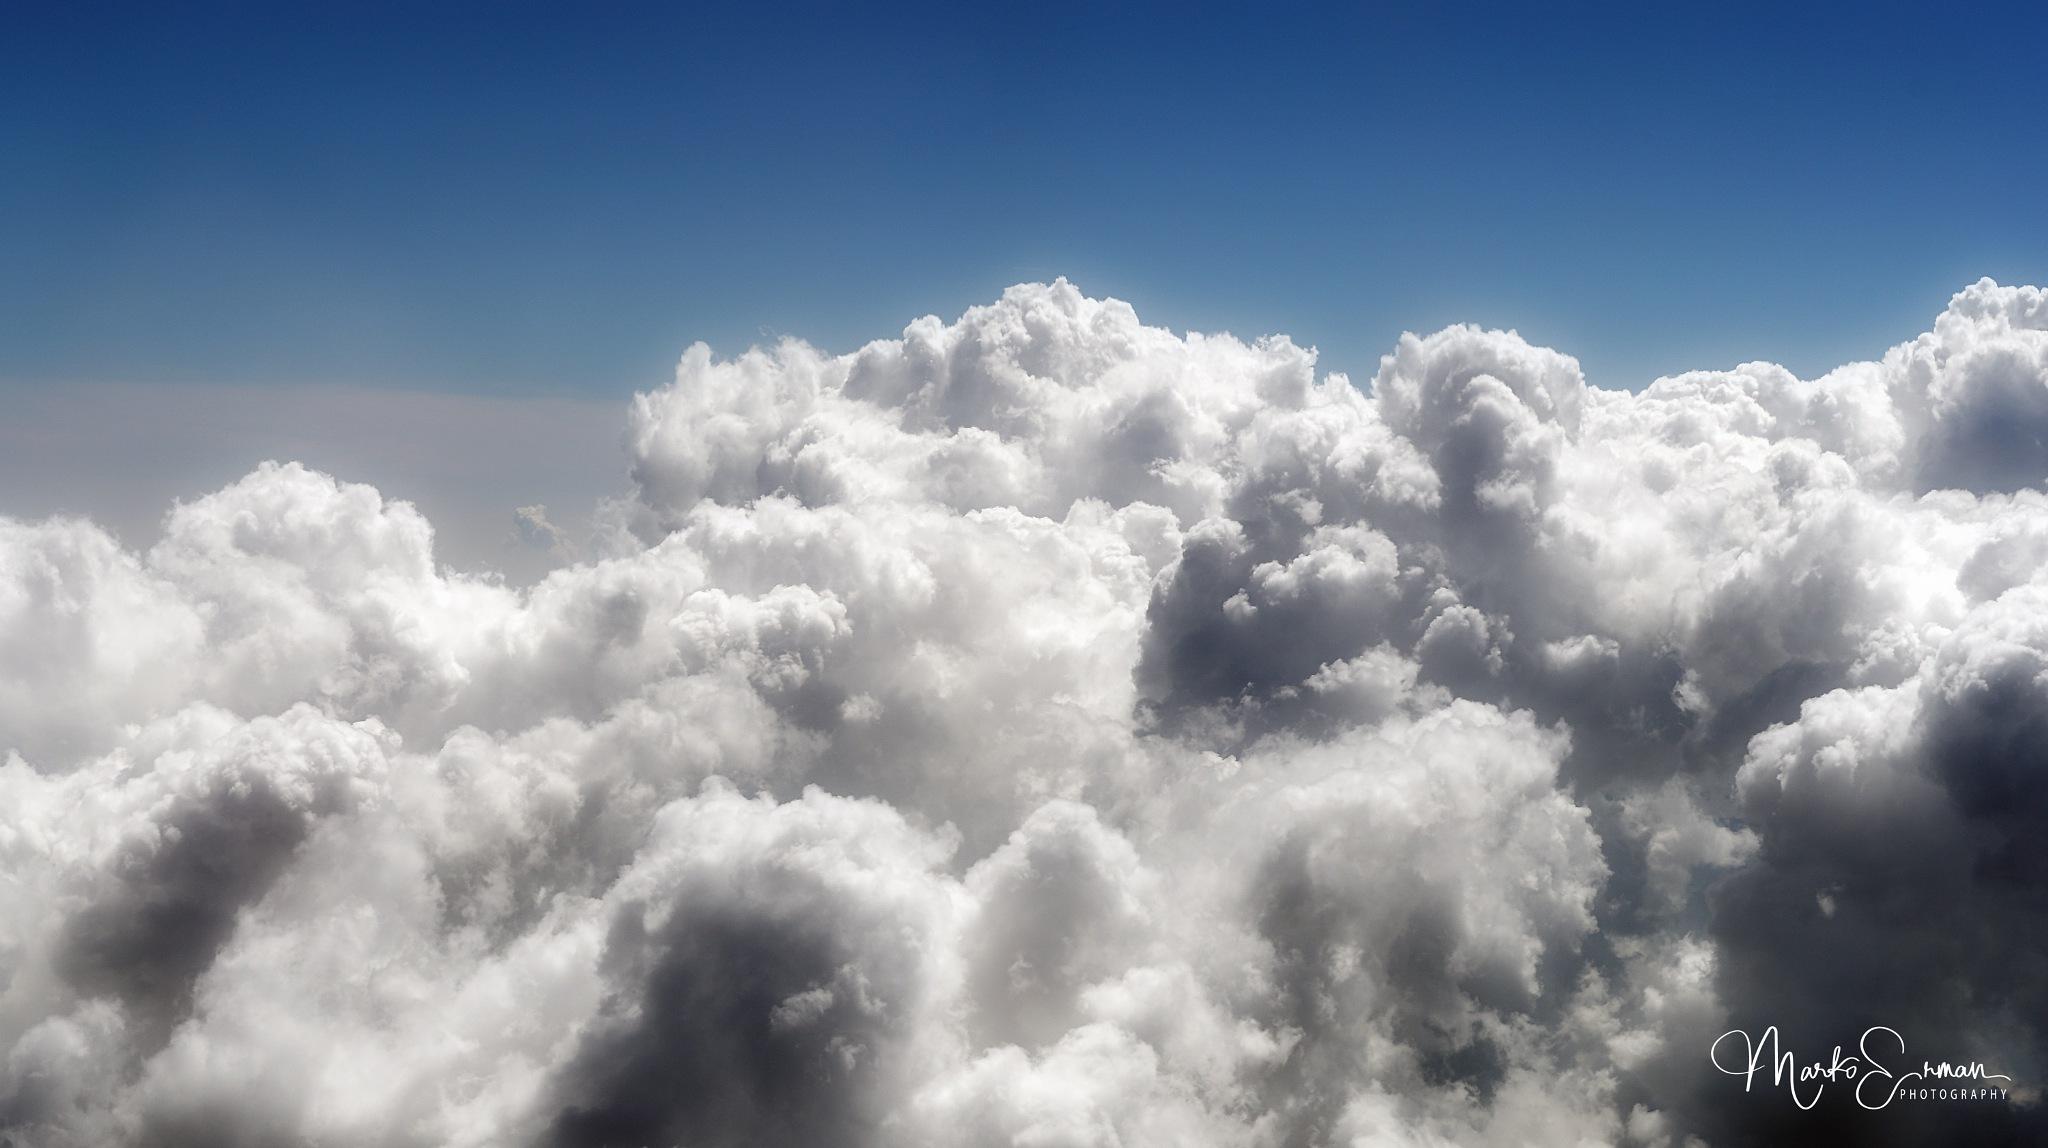 Flying  by Marko Erman